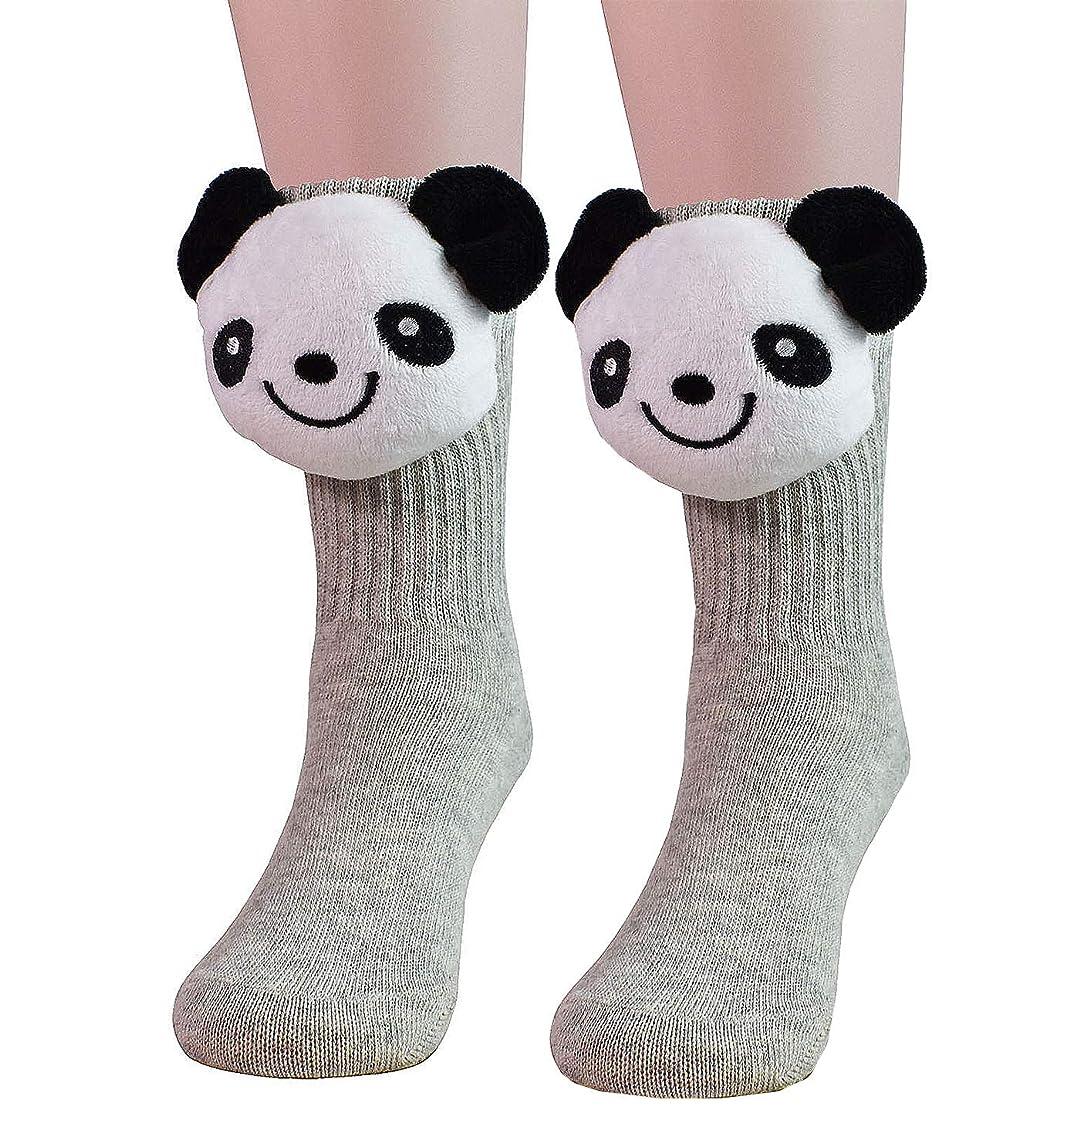 JIEEN Baby Boy Girl Socks Pile Heap Socks Cartoon Tube Socks Warm Leggings